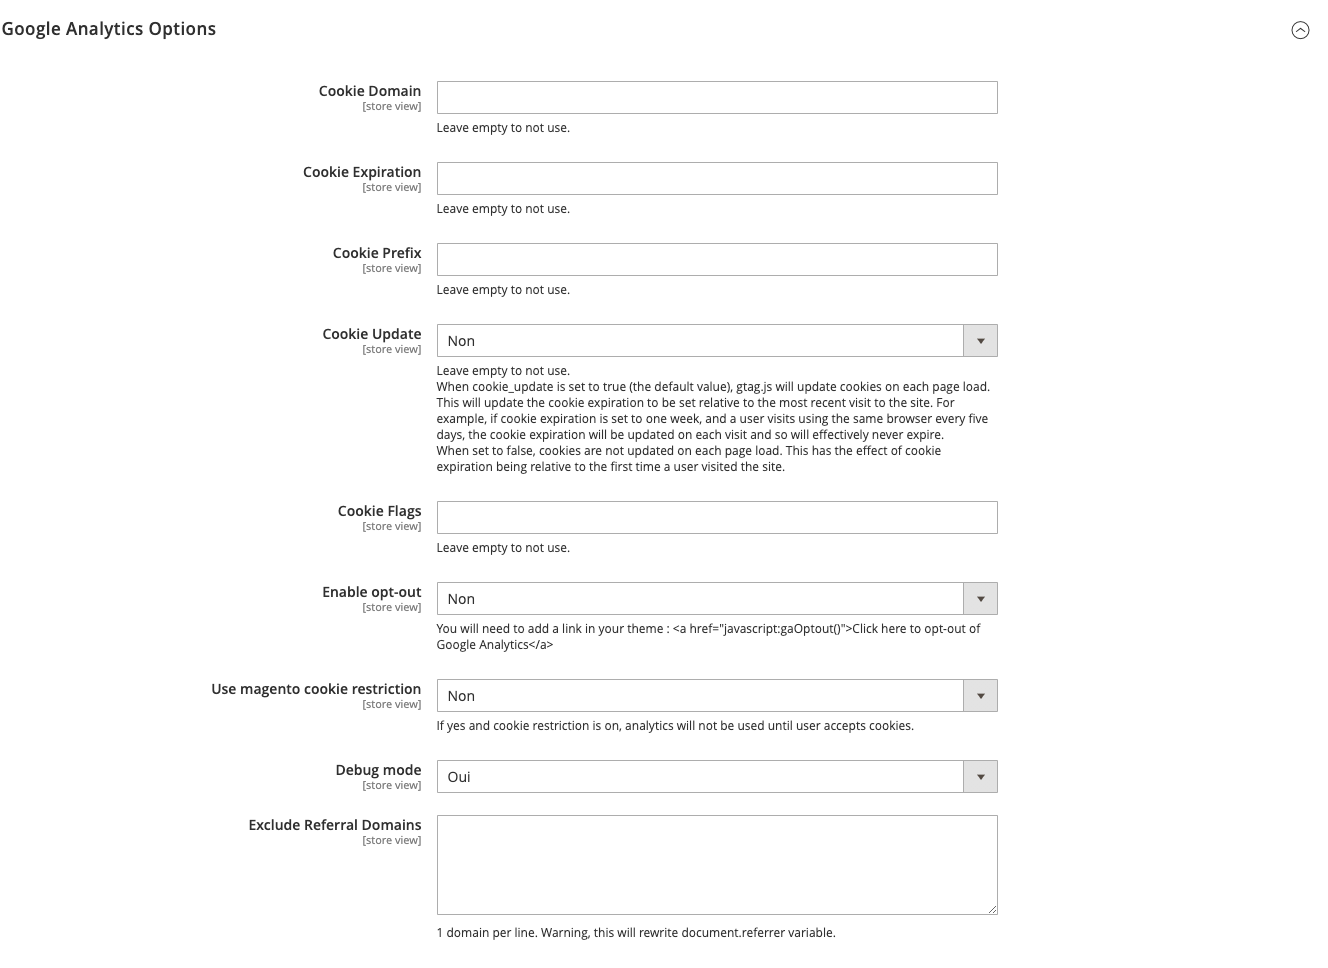 google analytics 4 - ga4 options - magento 2